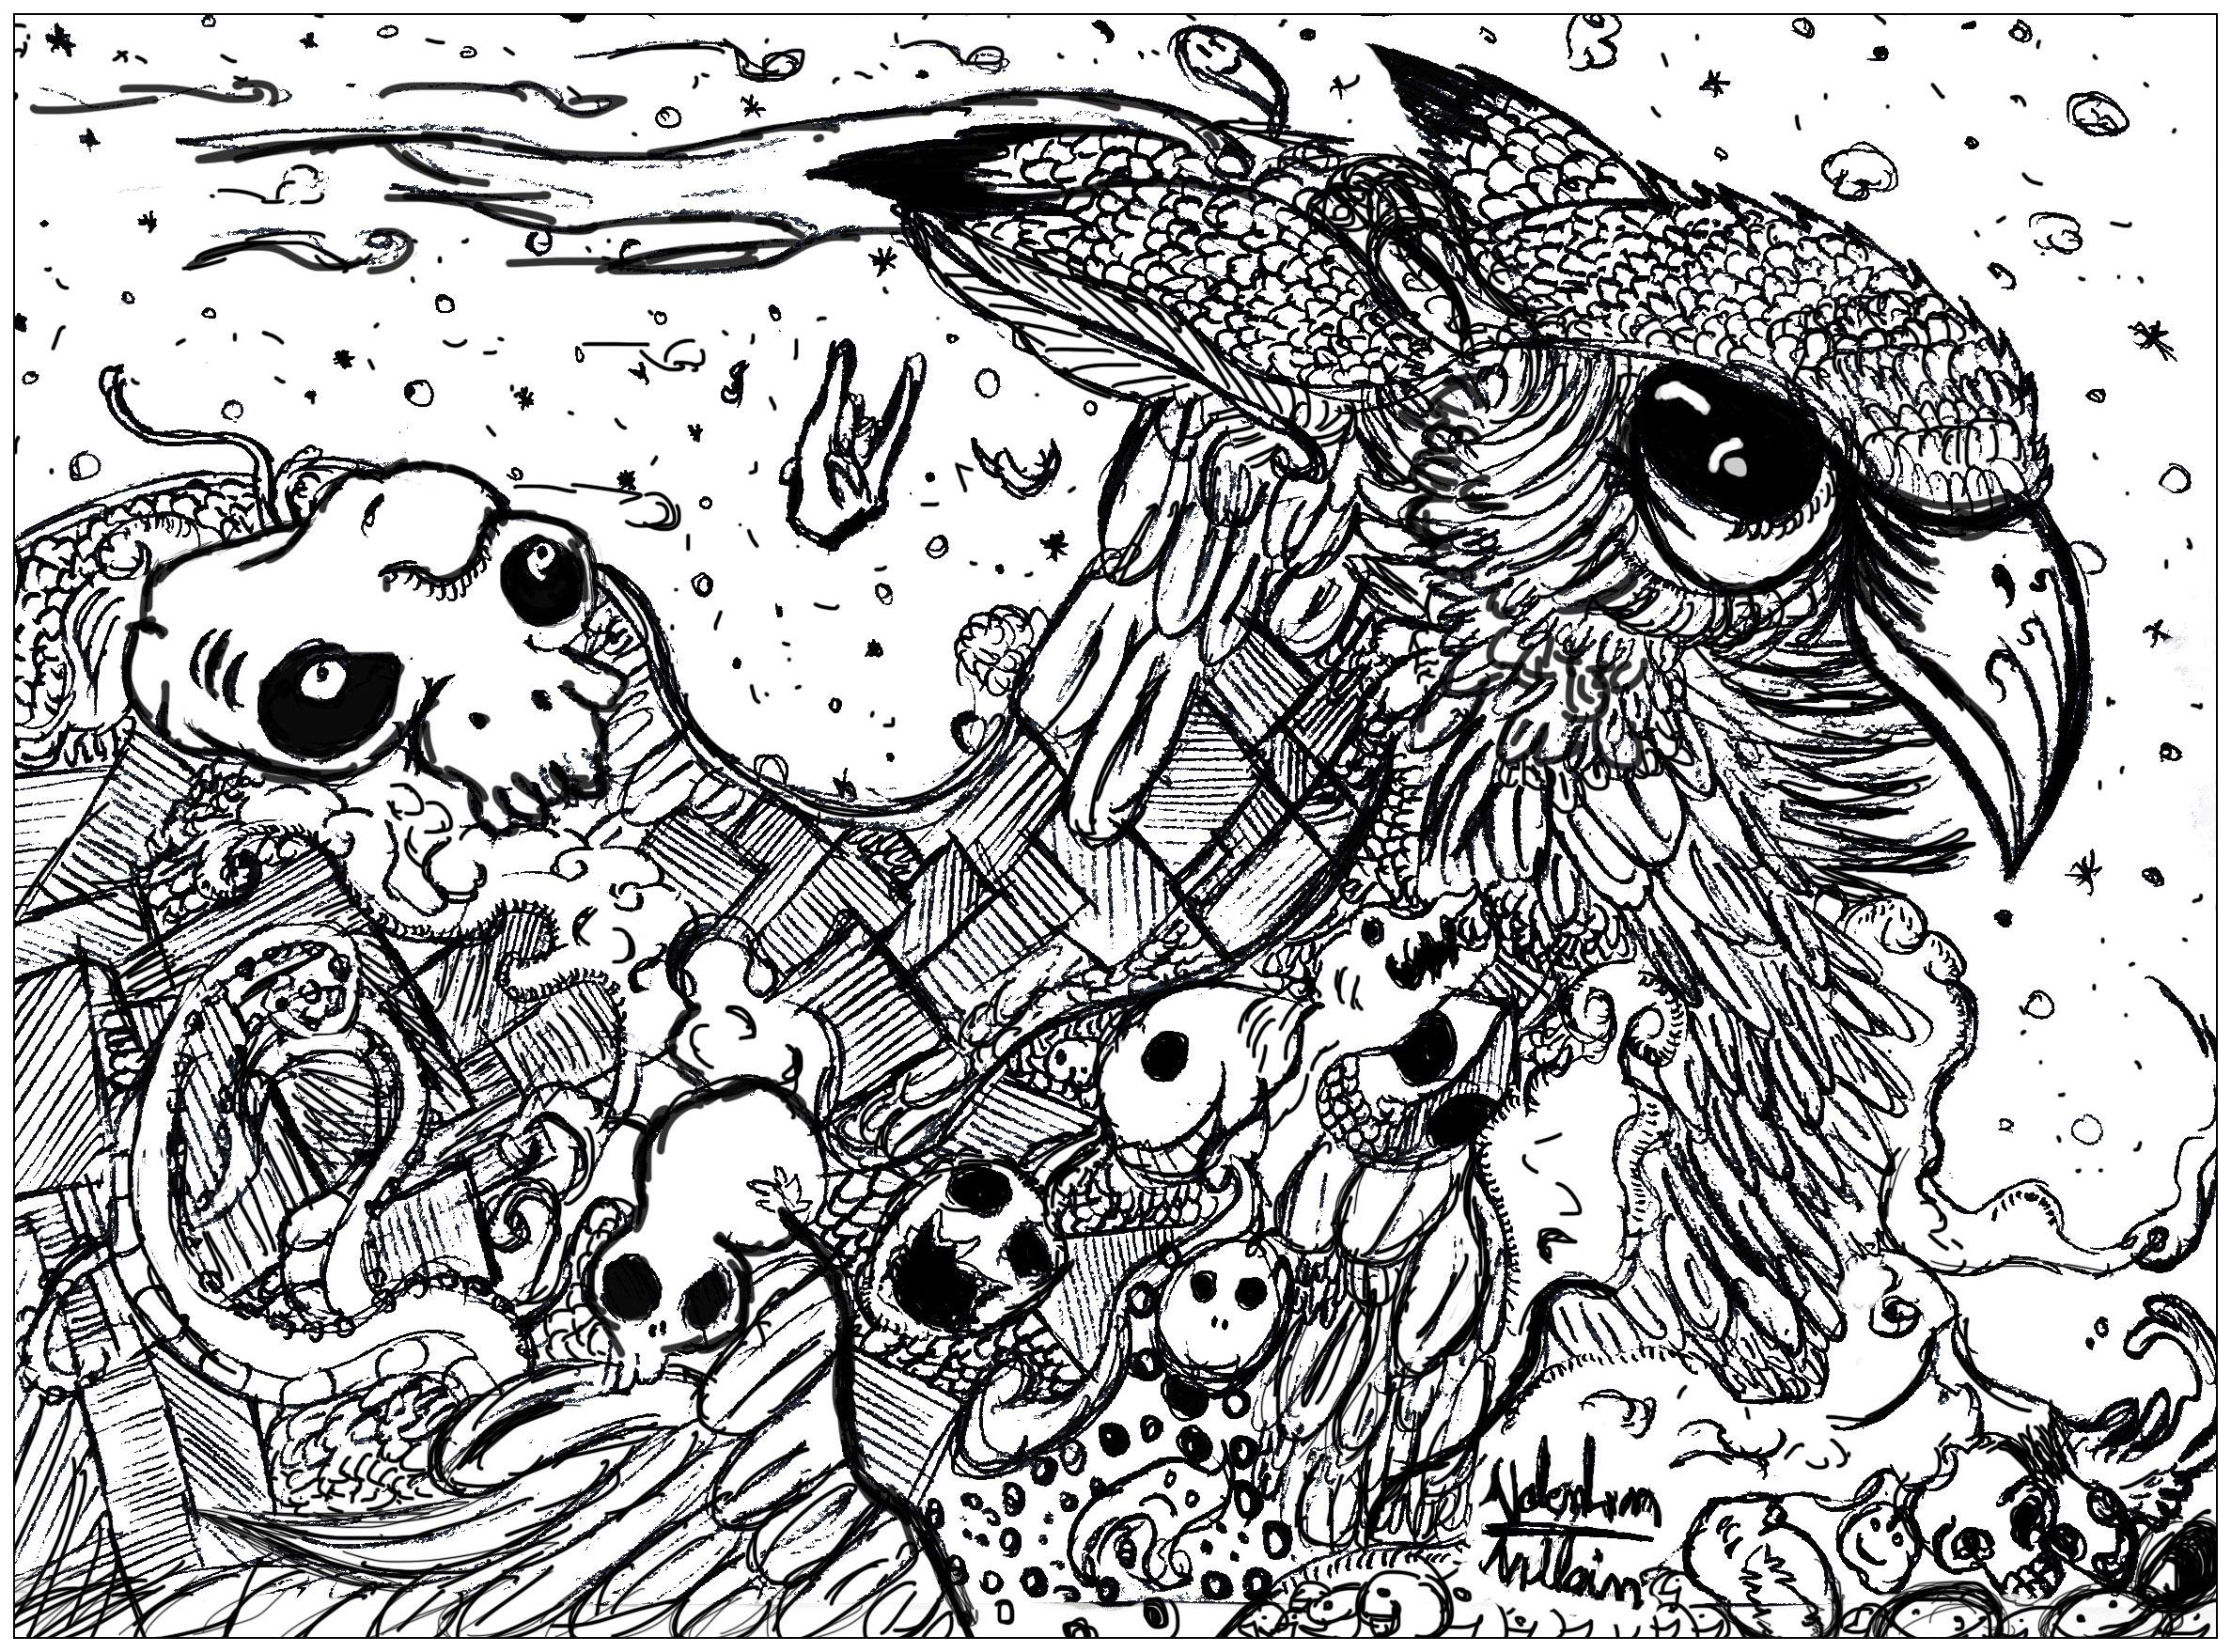 Un Doodle original representant un hibou